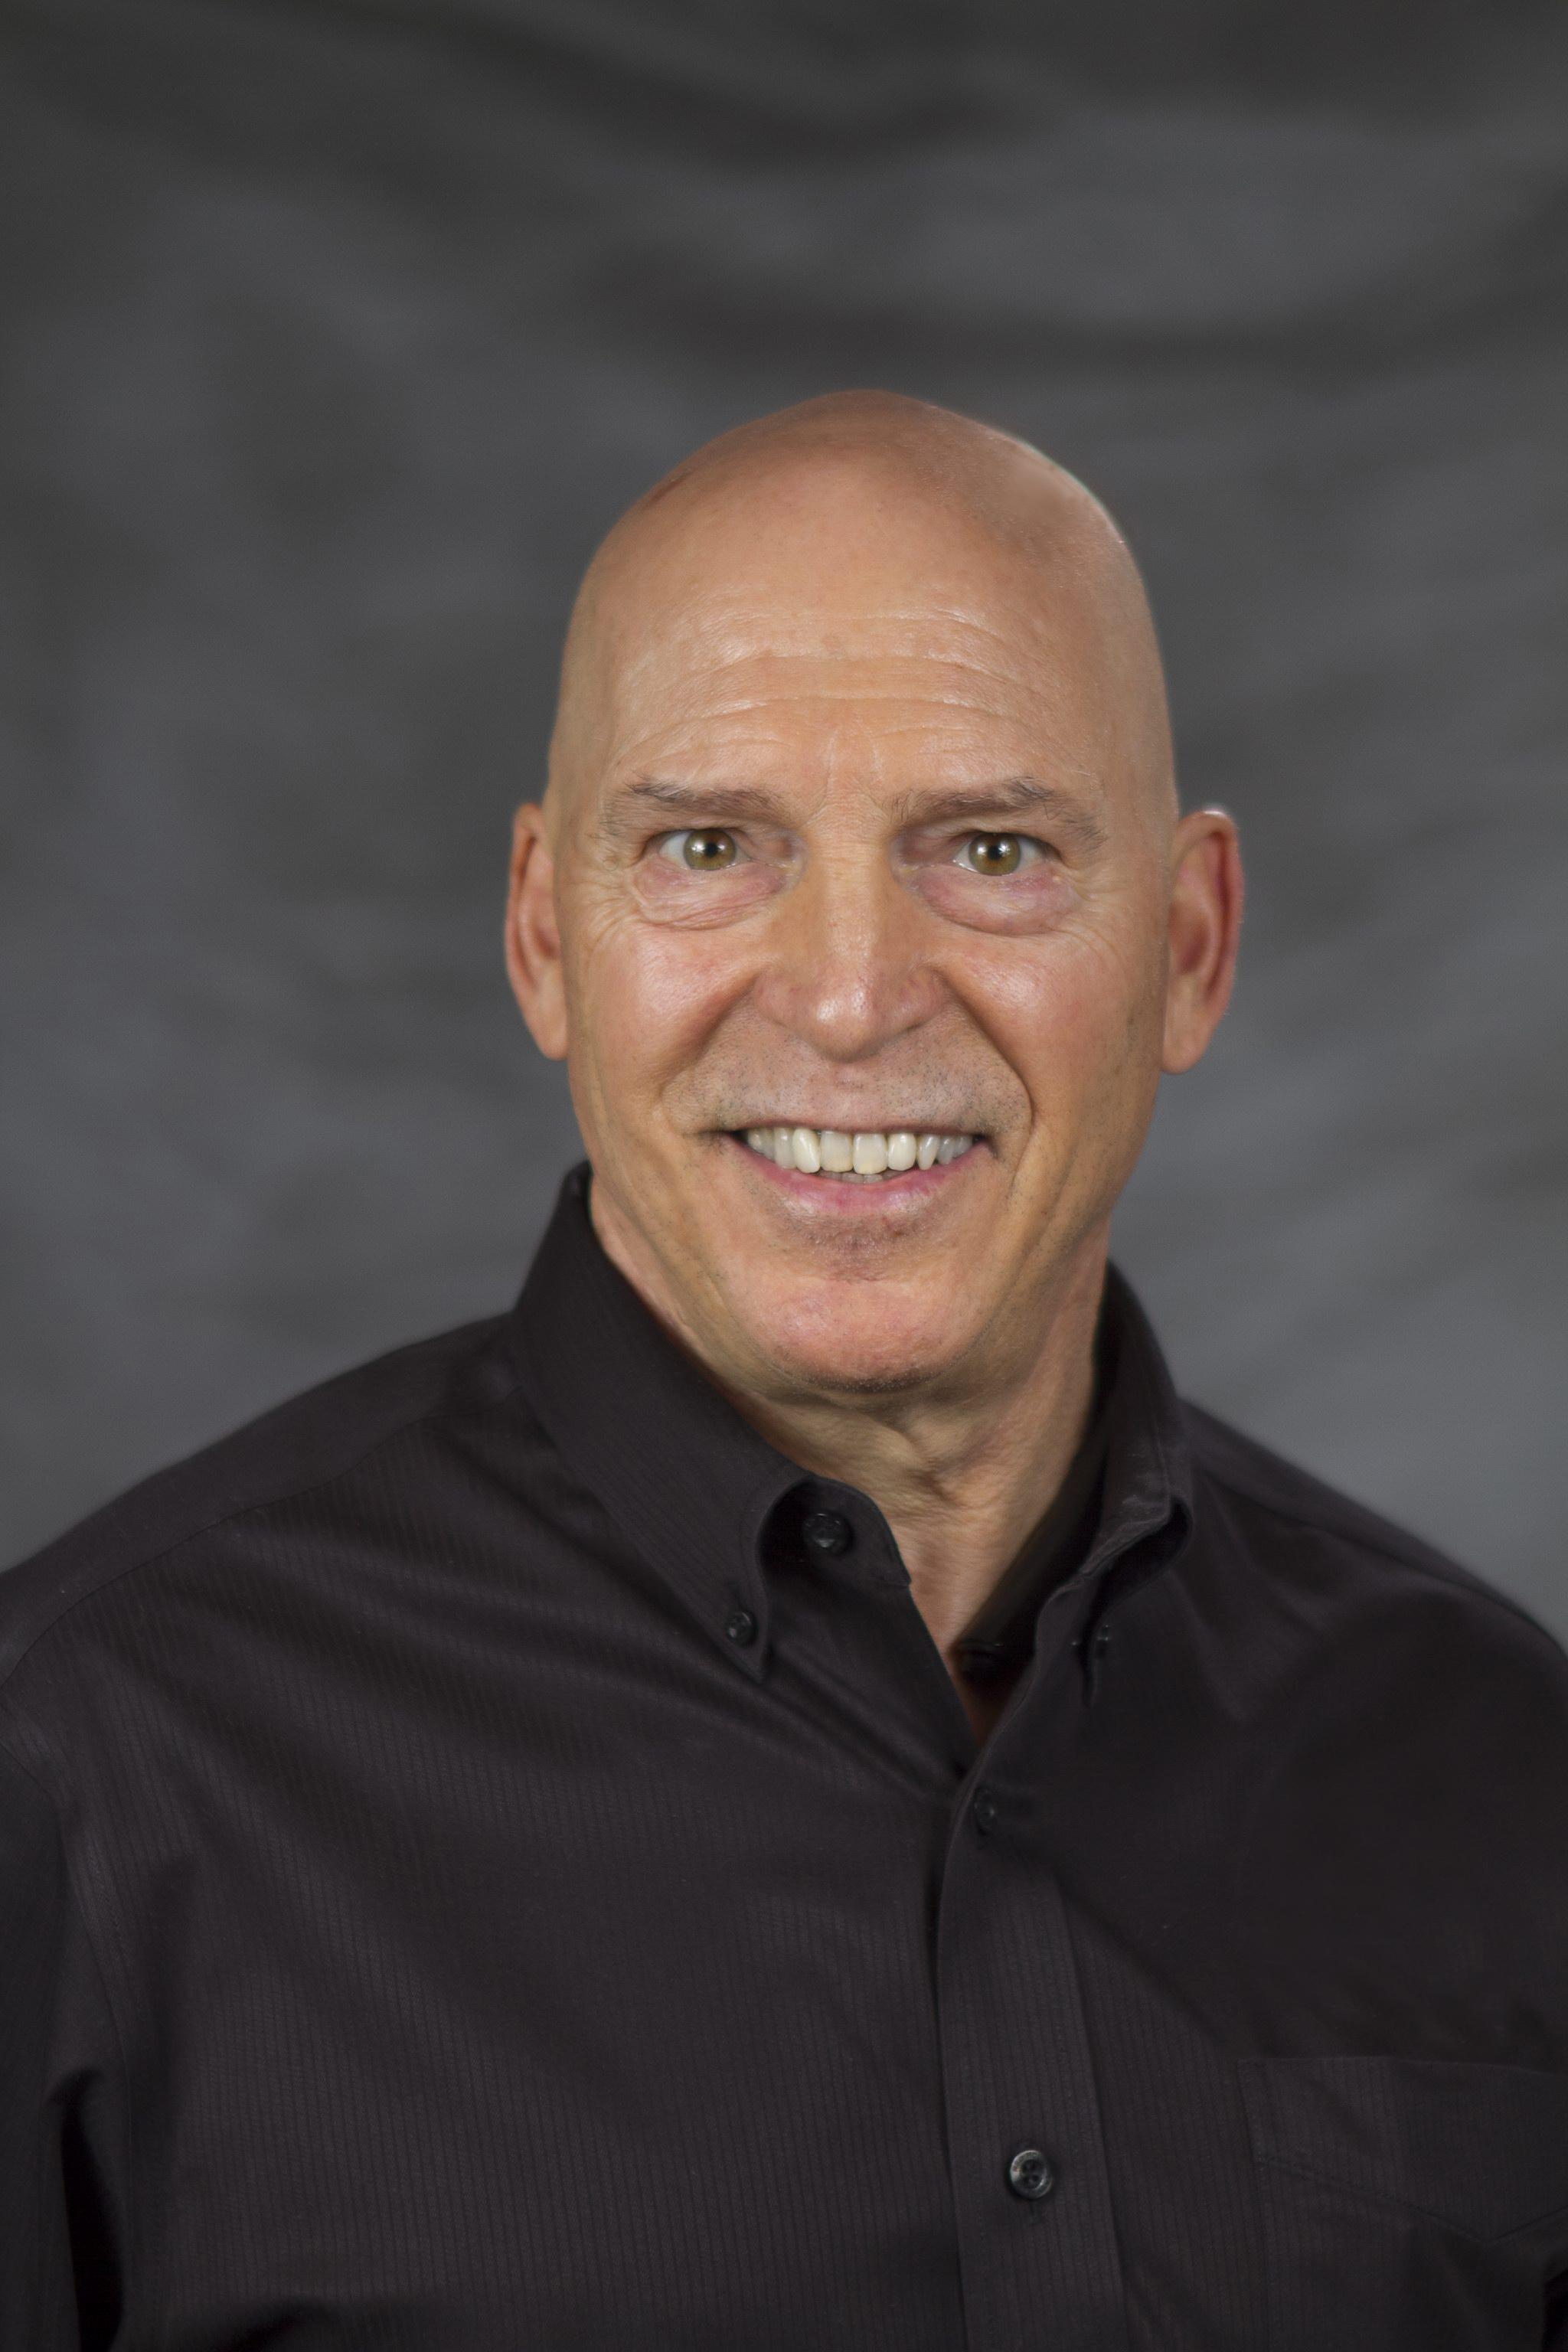 Gary Church | Health and Life Insurance Agent | San Jose, CA 95116